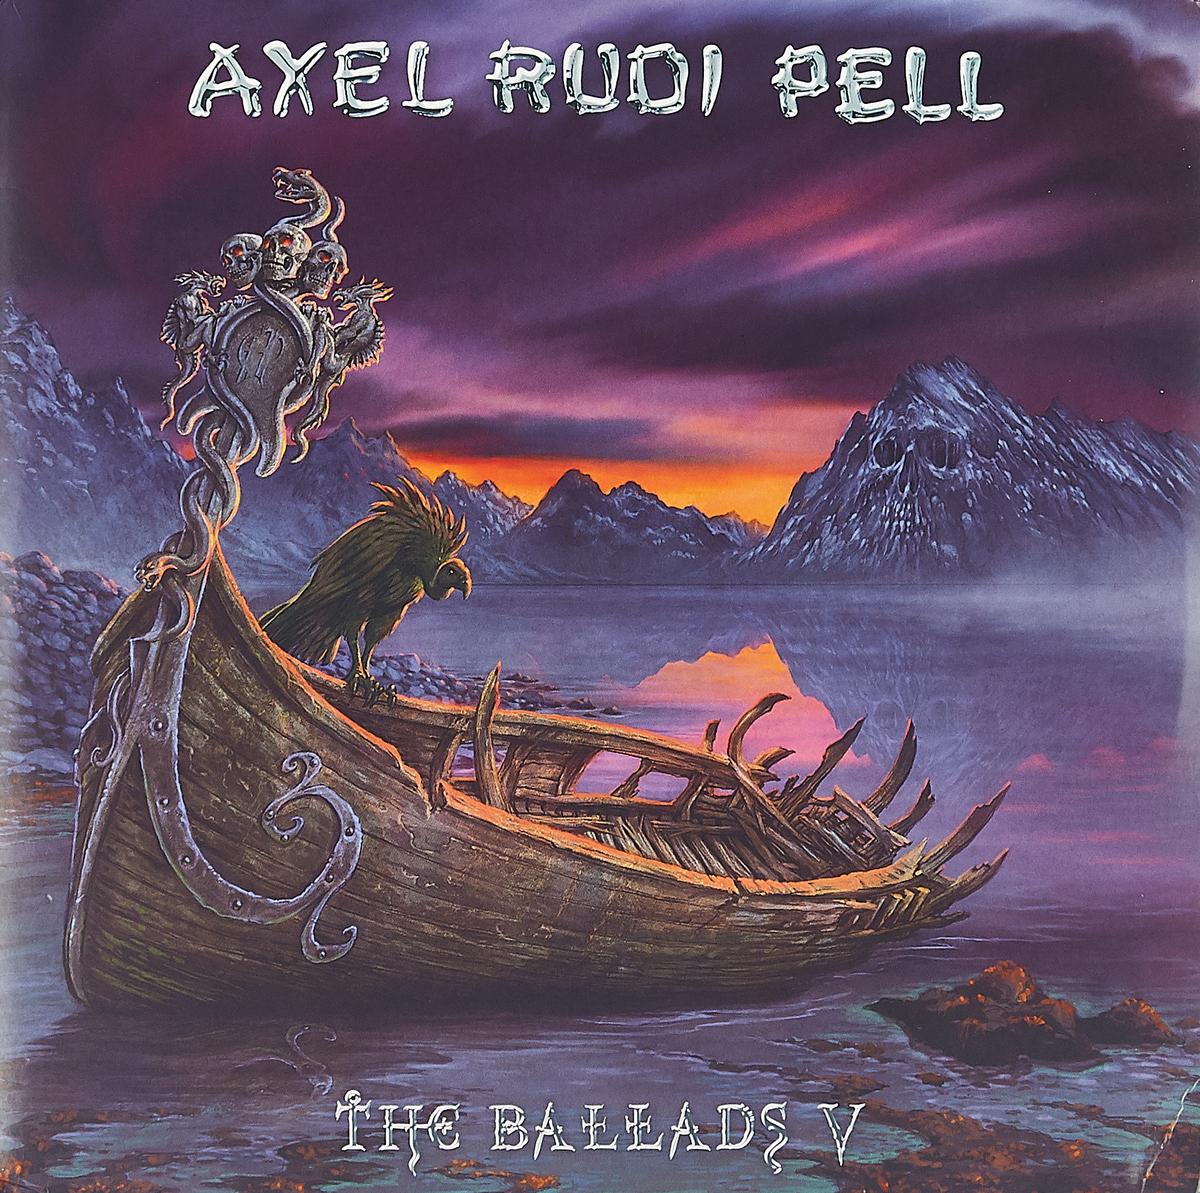 Аксель Руди Пелл Axel Rudi Pell. The Ballads V (2 LP + CD) axel rudi pell knight treasures live and more 2 dvd